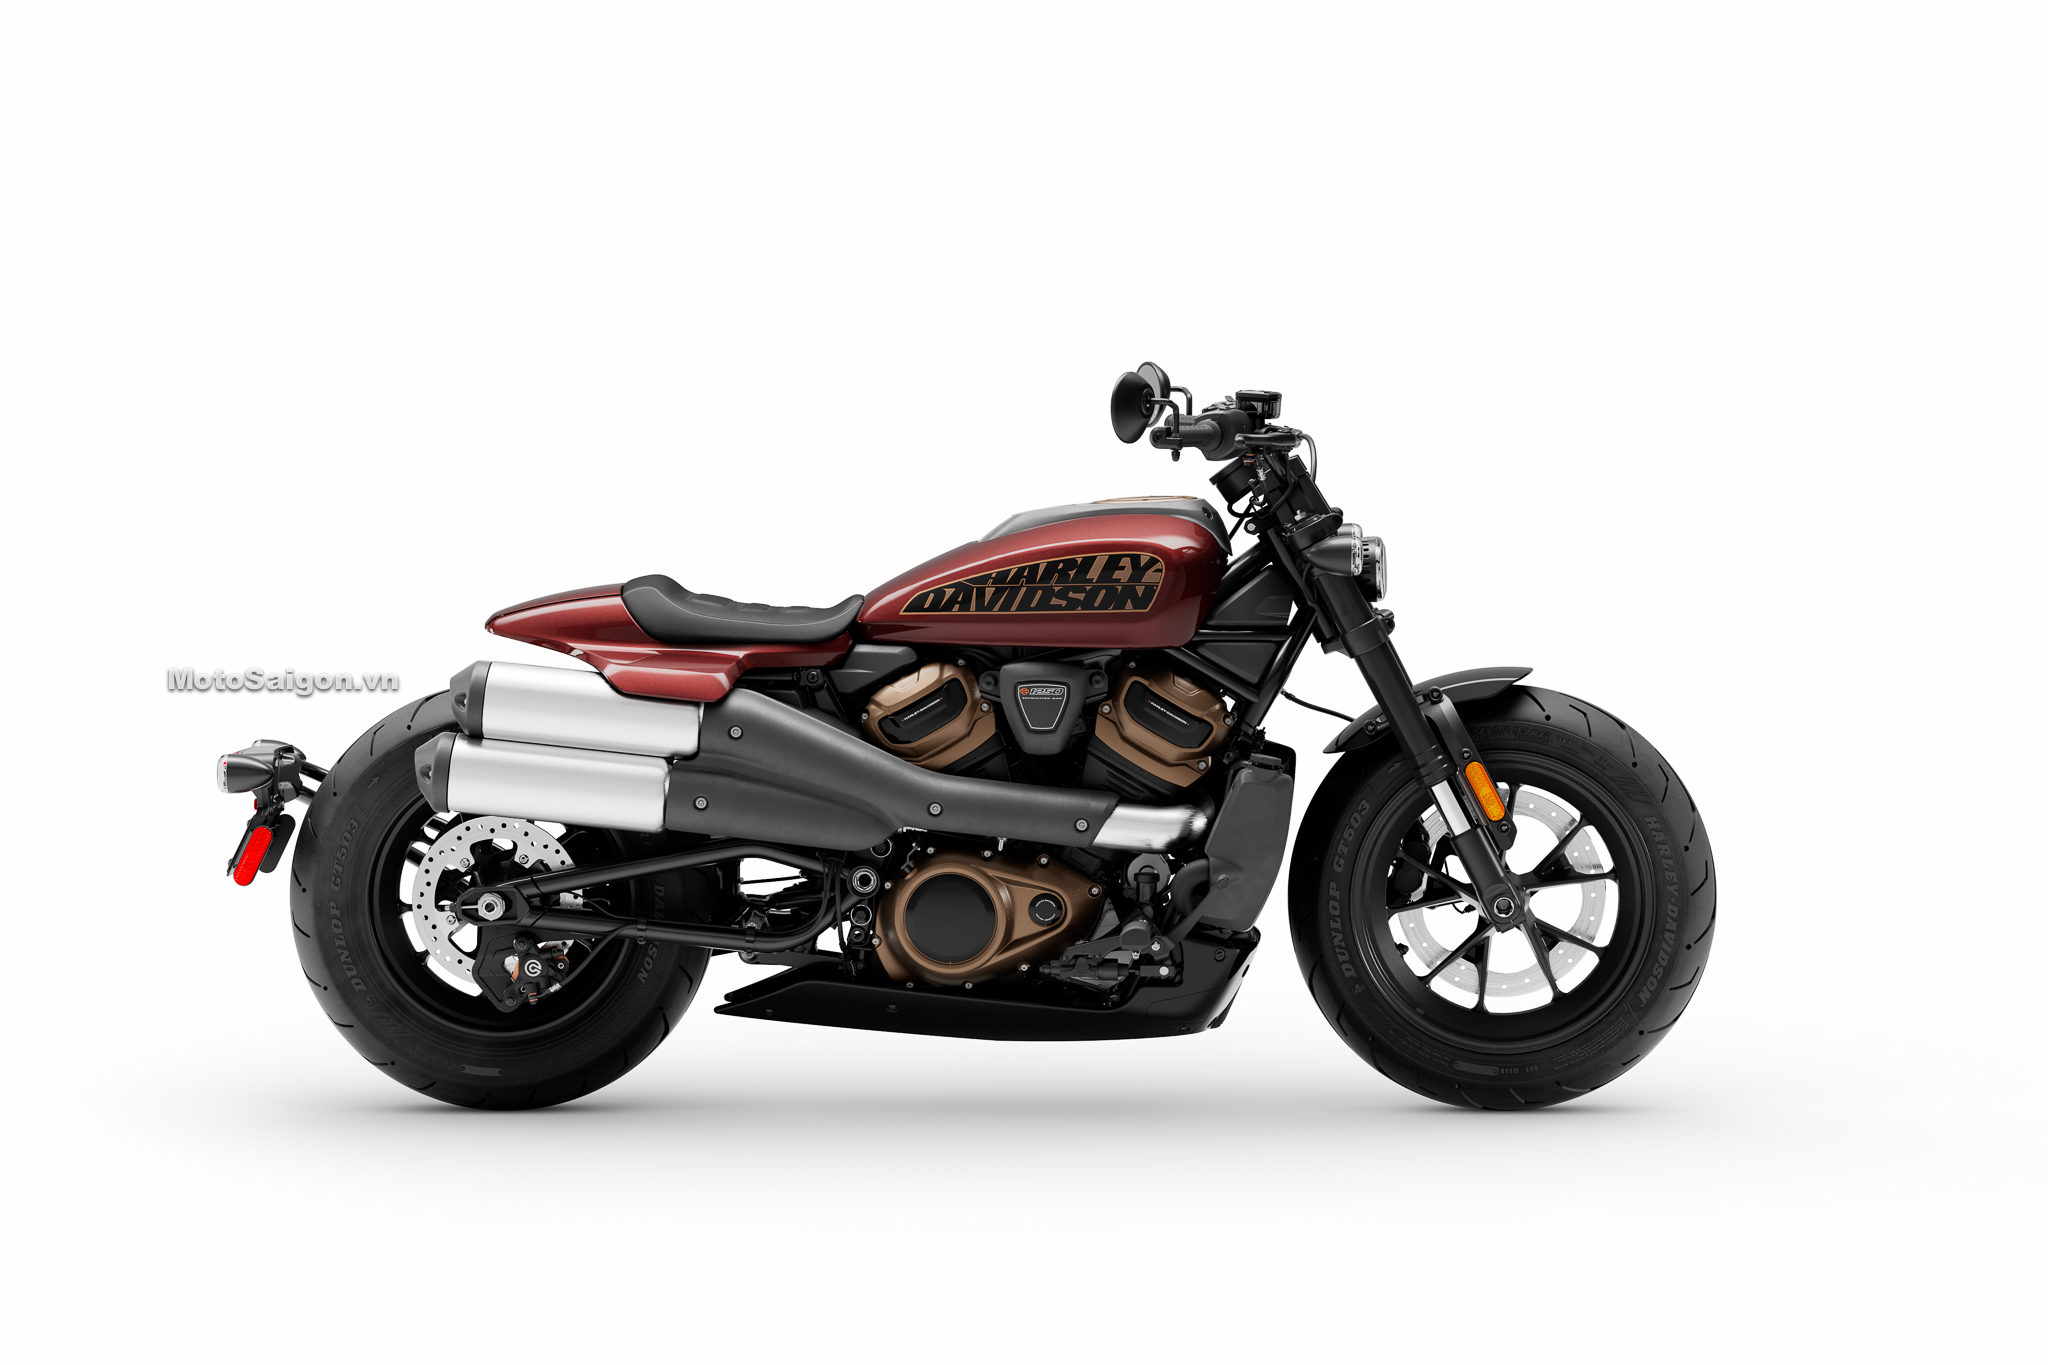 Harley-Davidson Sportster S màu đỏ